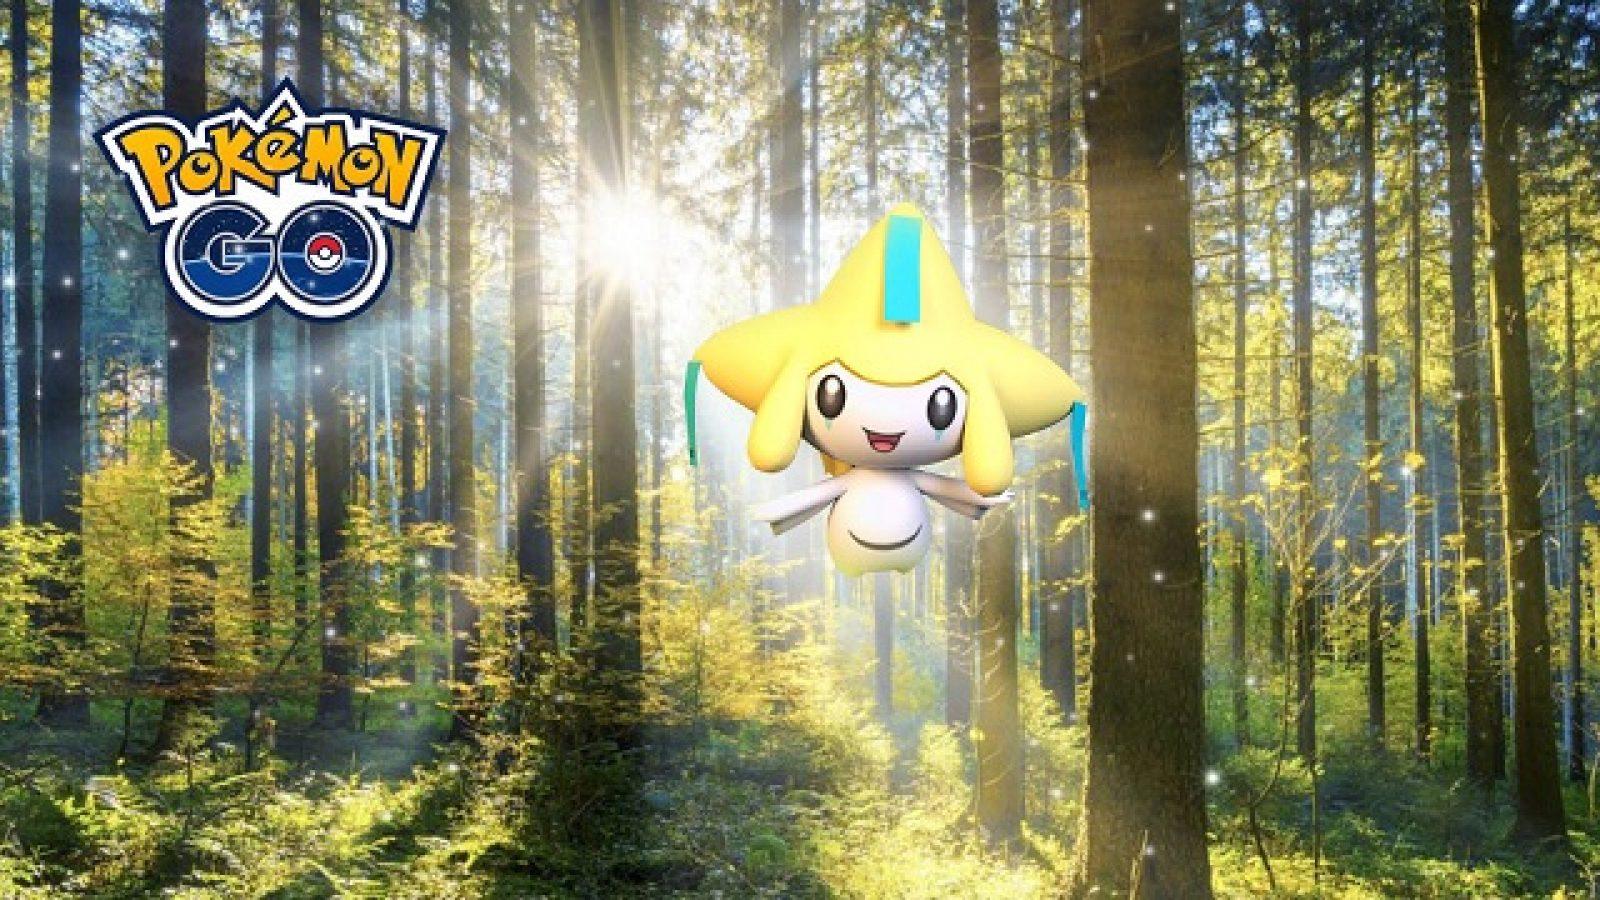 Pokémon GO - Seribu Tahun Tidur, Tugas dan Hadiah Penelitian Jirachi 1